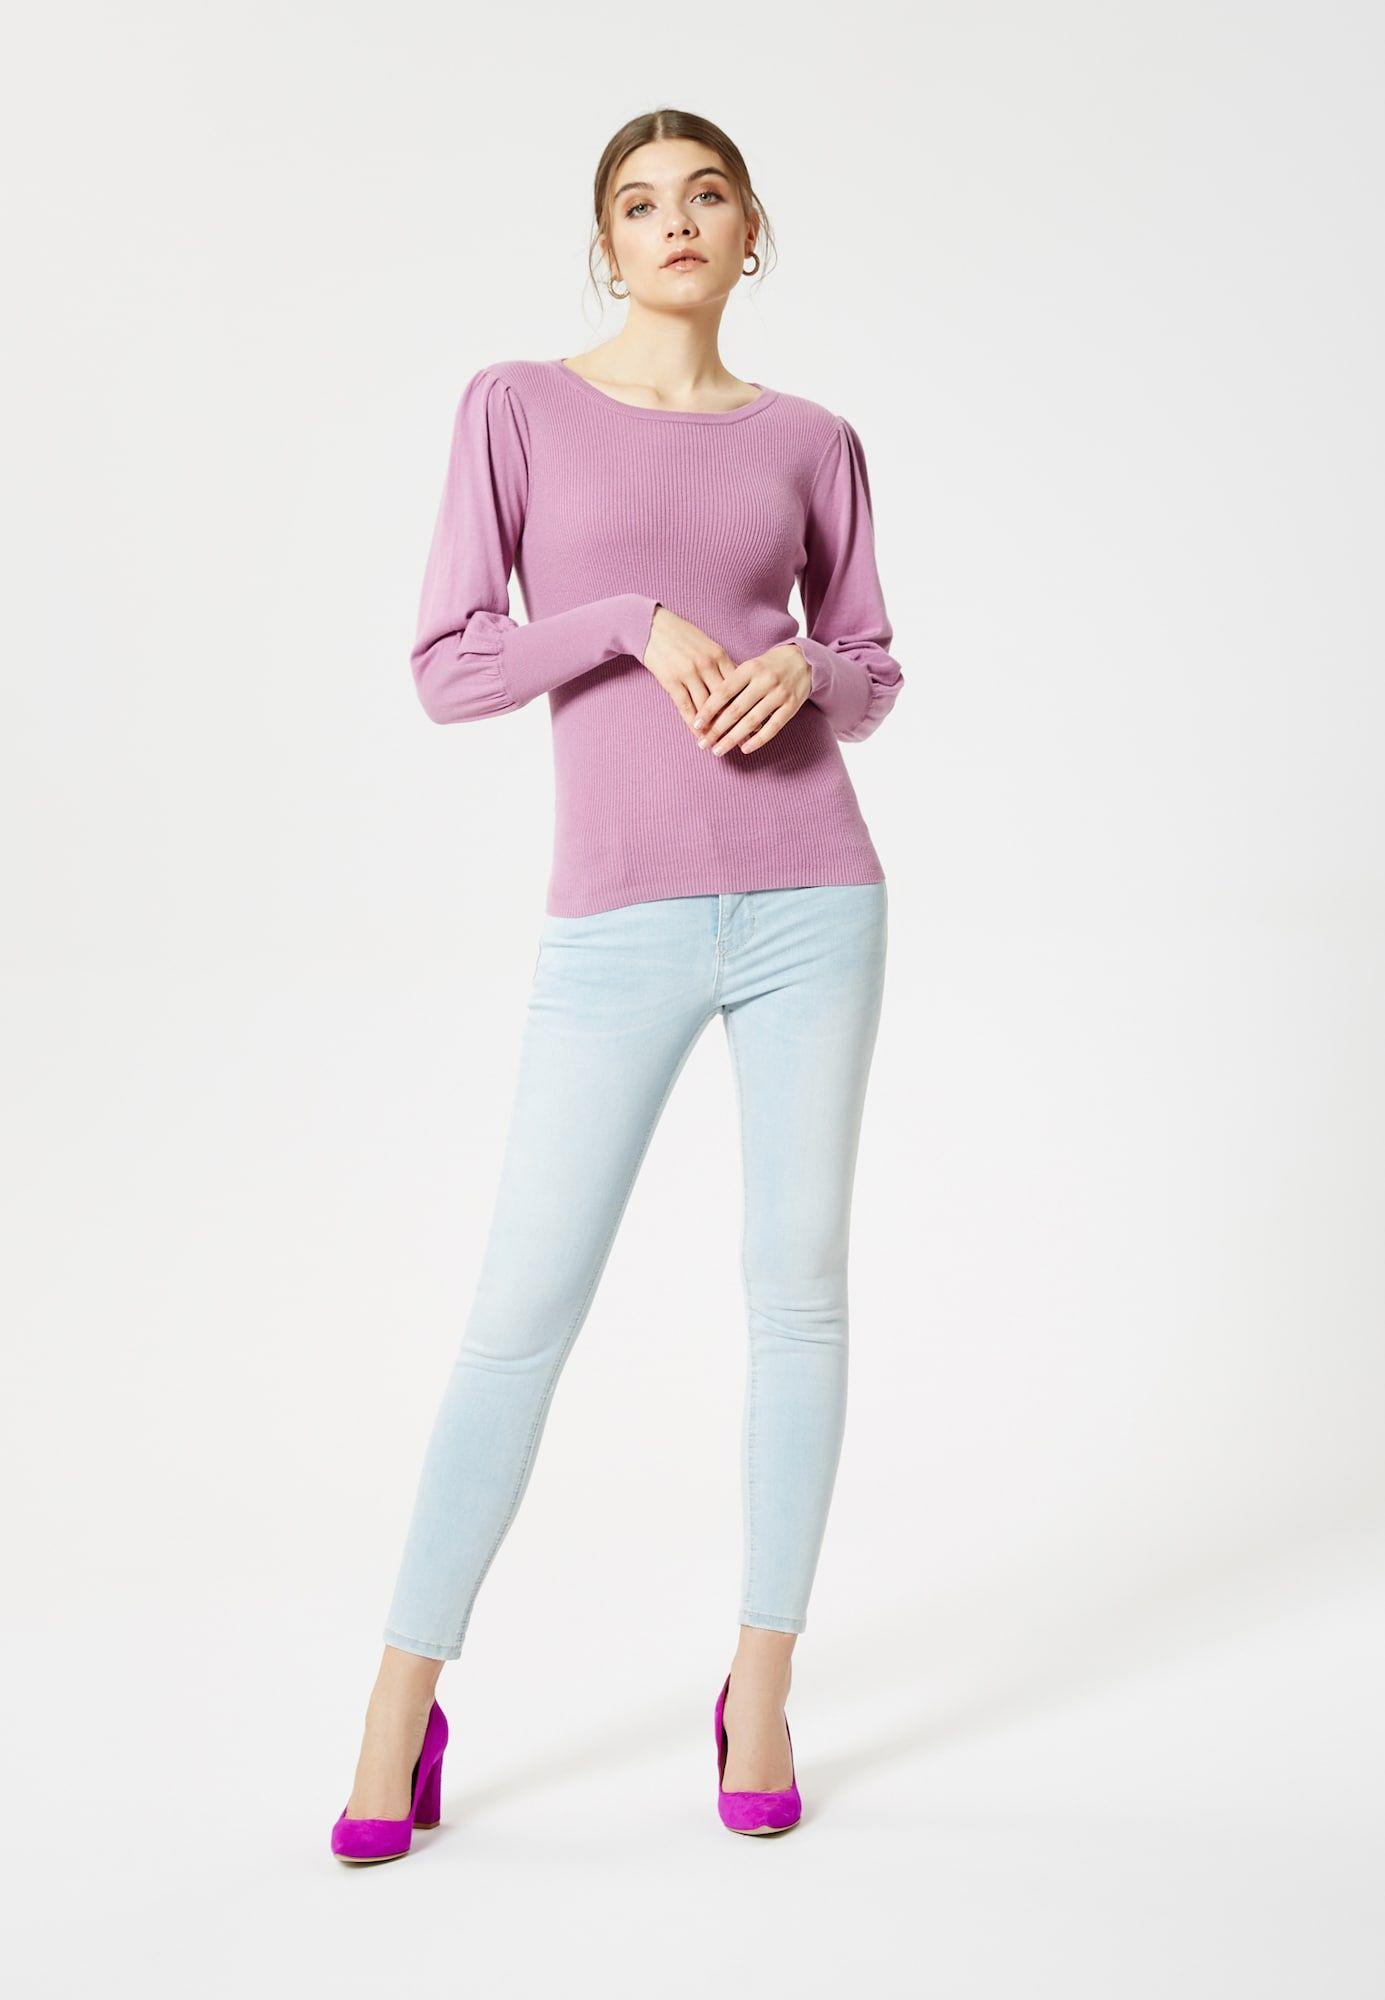 Mymo Pullover Damen Altrosa Grosse S Pullover Damen Pullover Und Damen